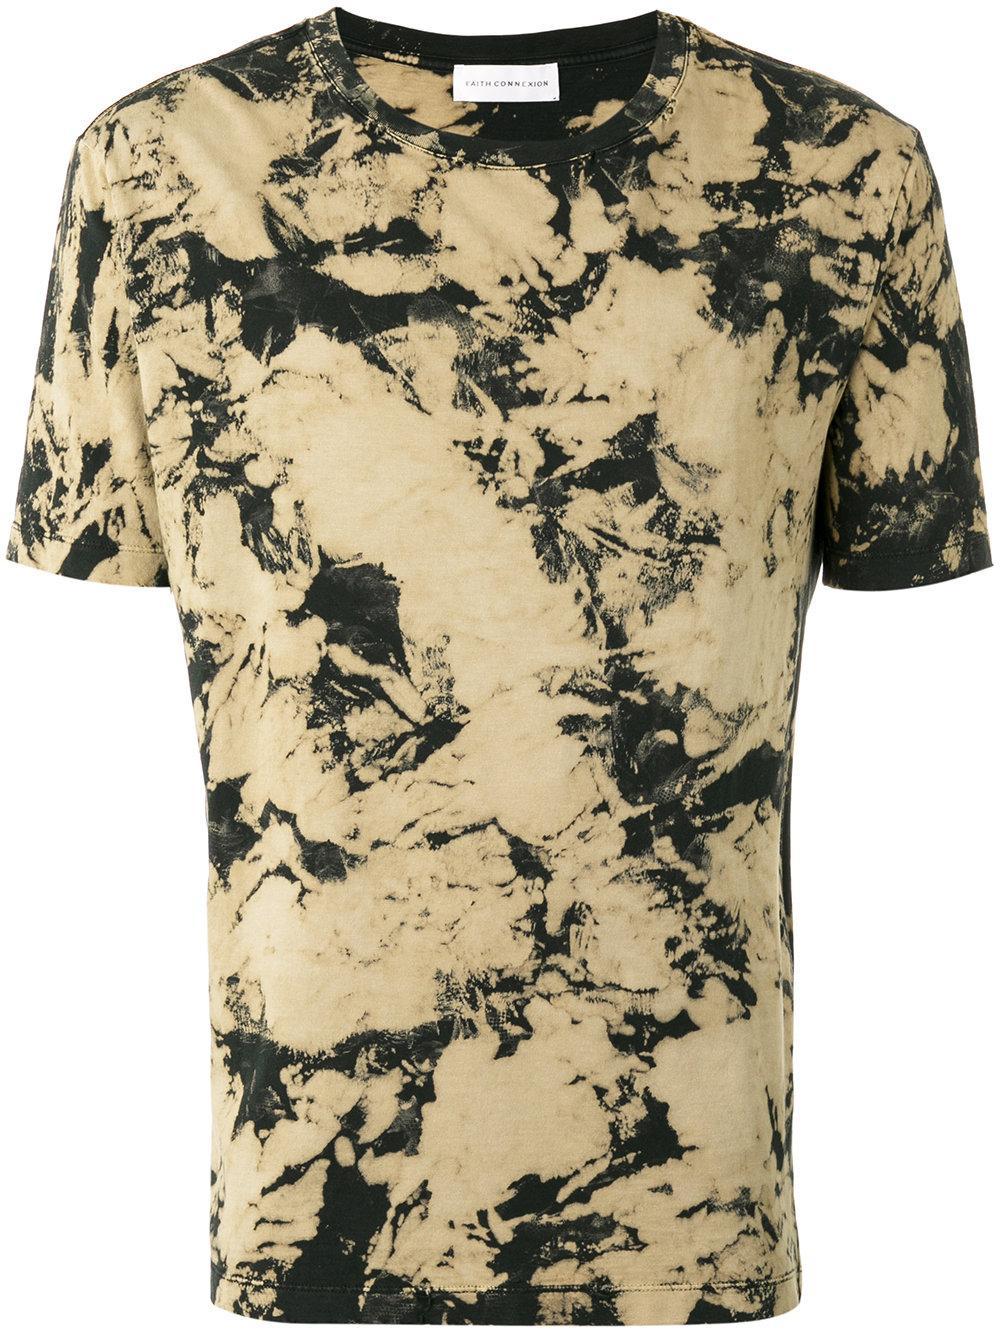 Faith connexion tie dye print t shirt unisex cotton for Tie dye printed shirts